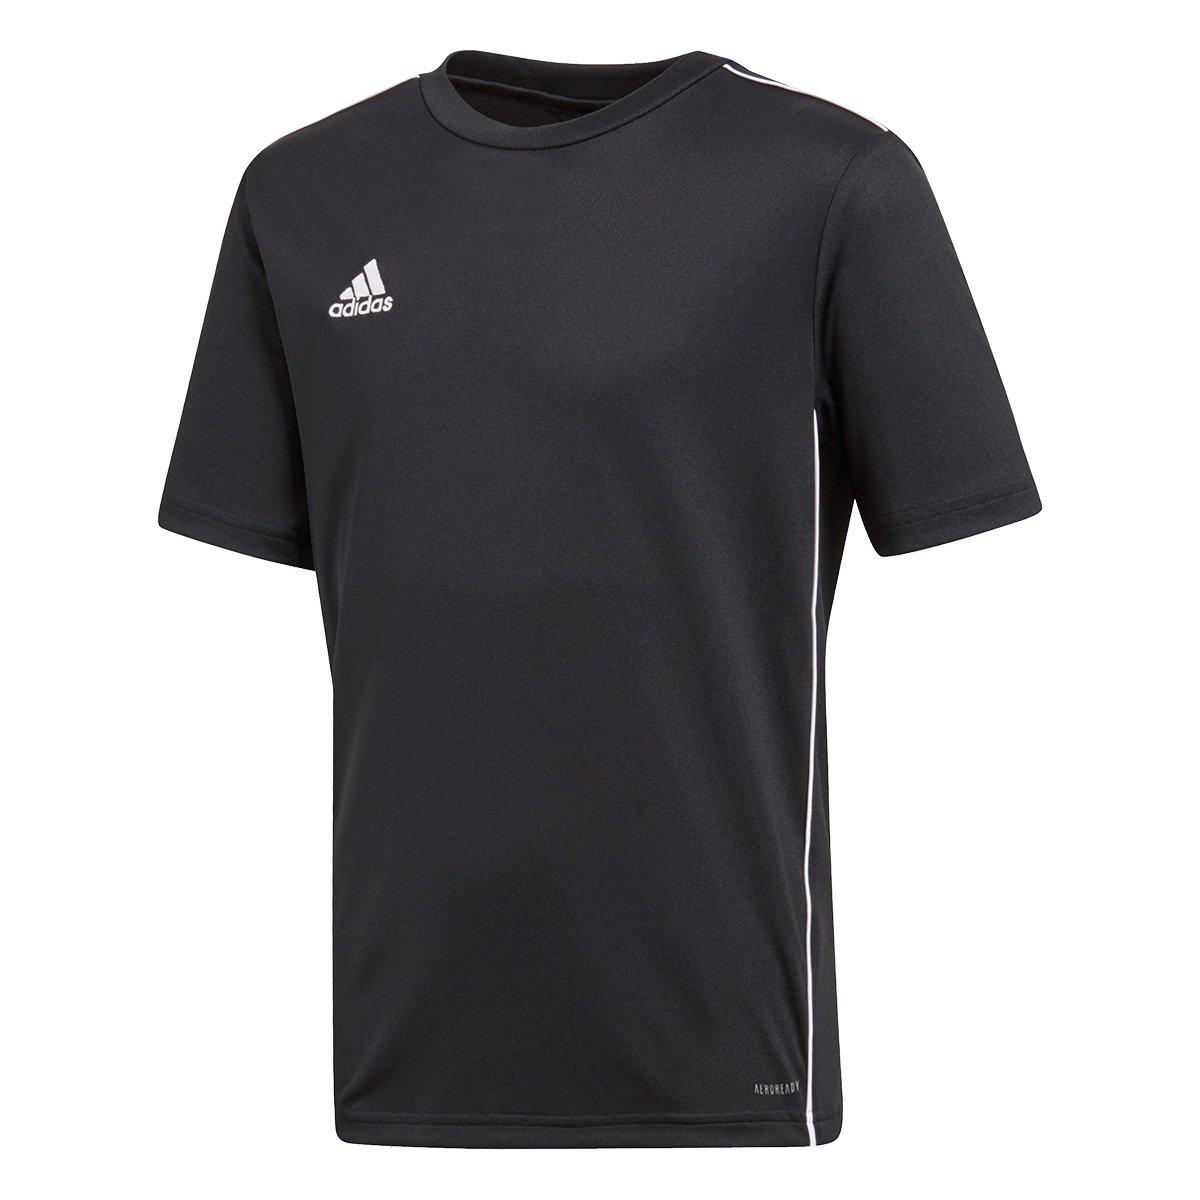 5eb28a9792 Camiseta Infantil Adidas Core 18